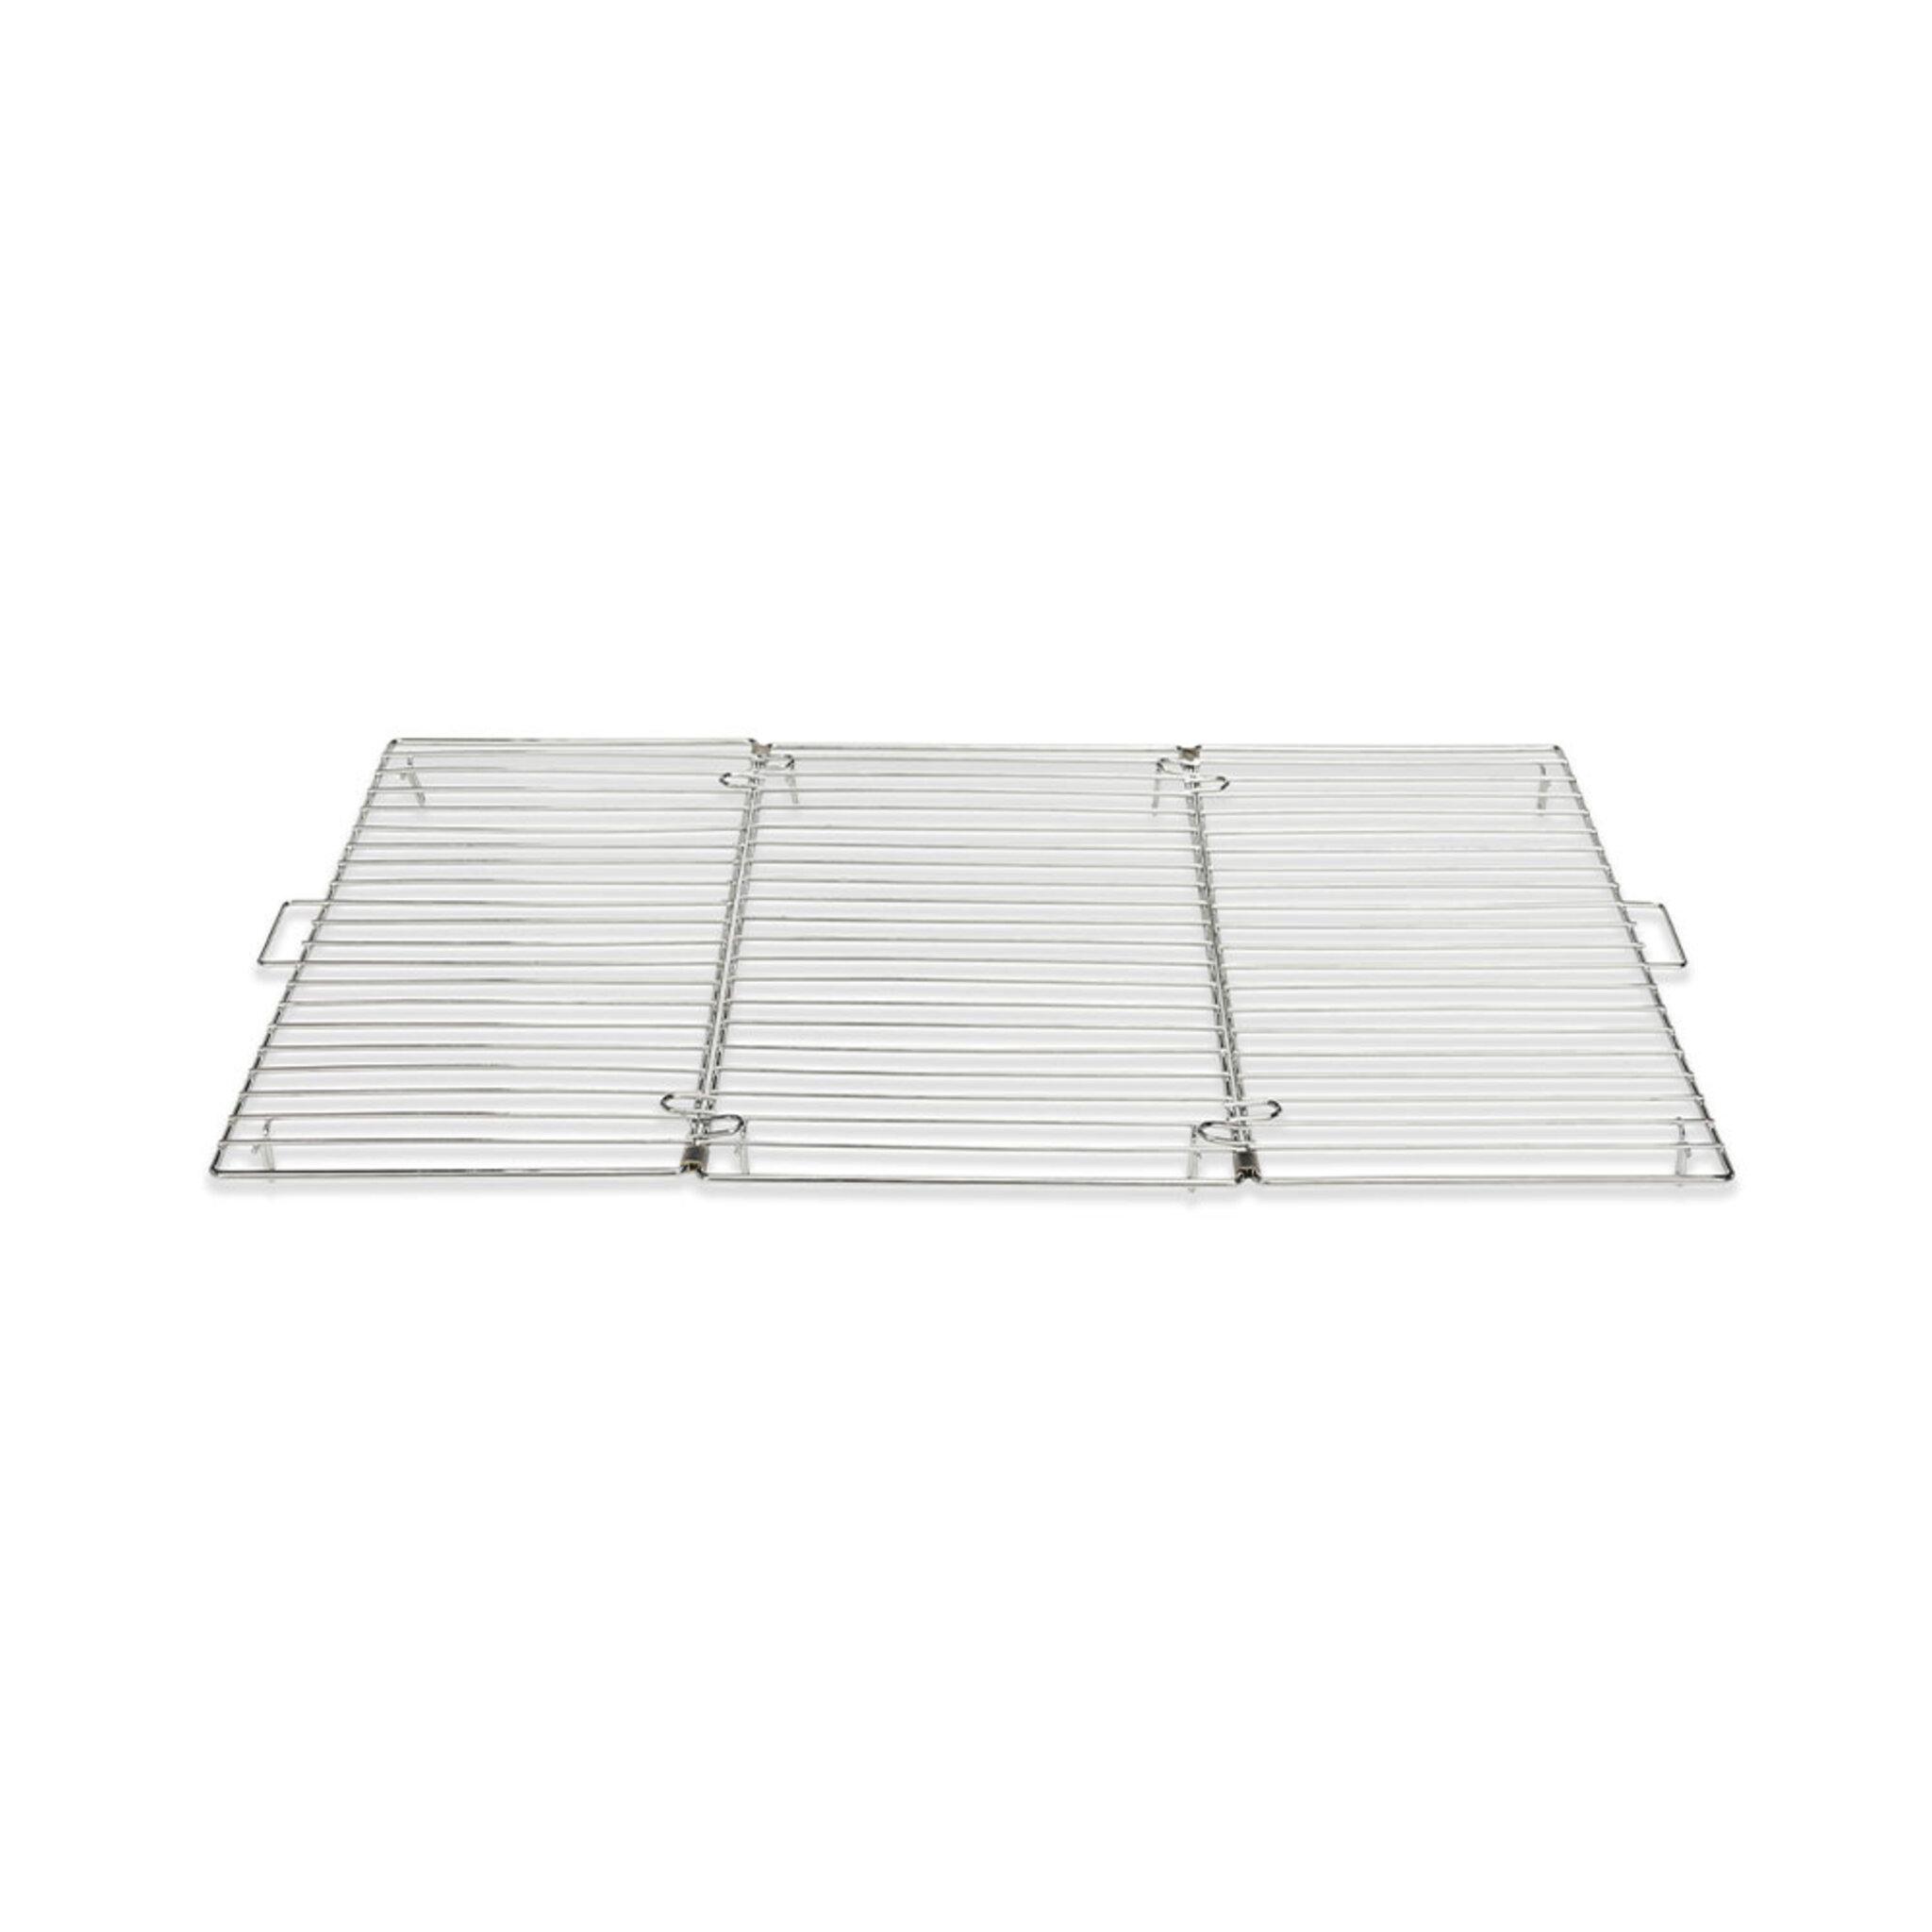 Bakgaller vikbar stål - 46/18 cm, L46/18cm B32cm